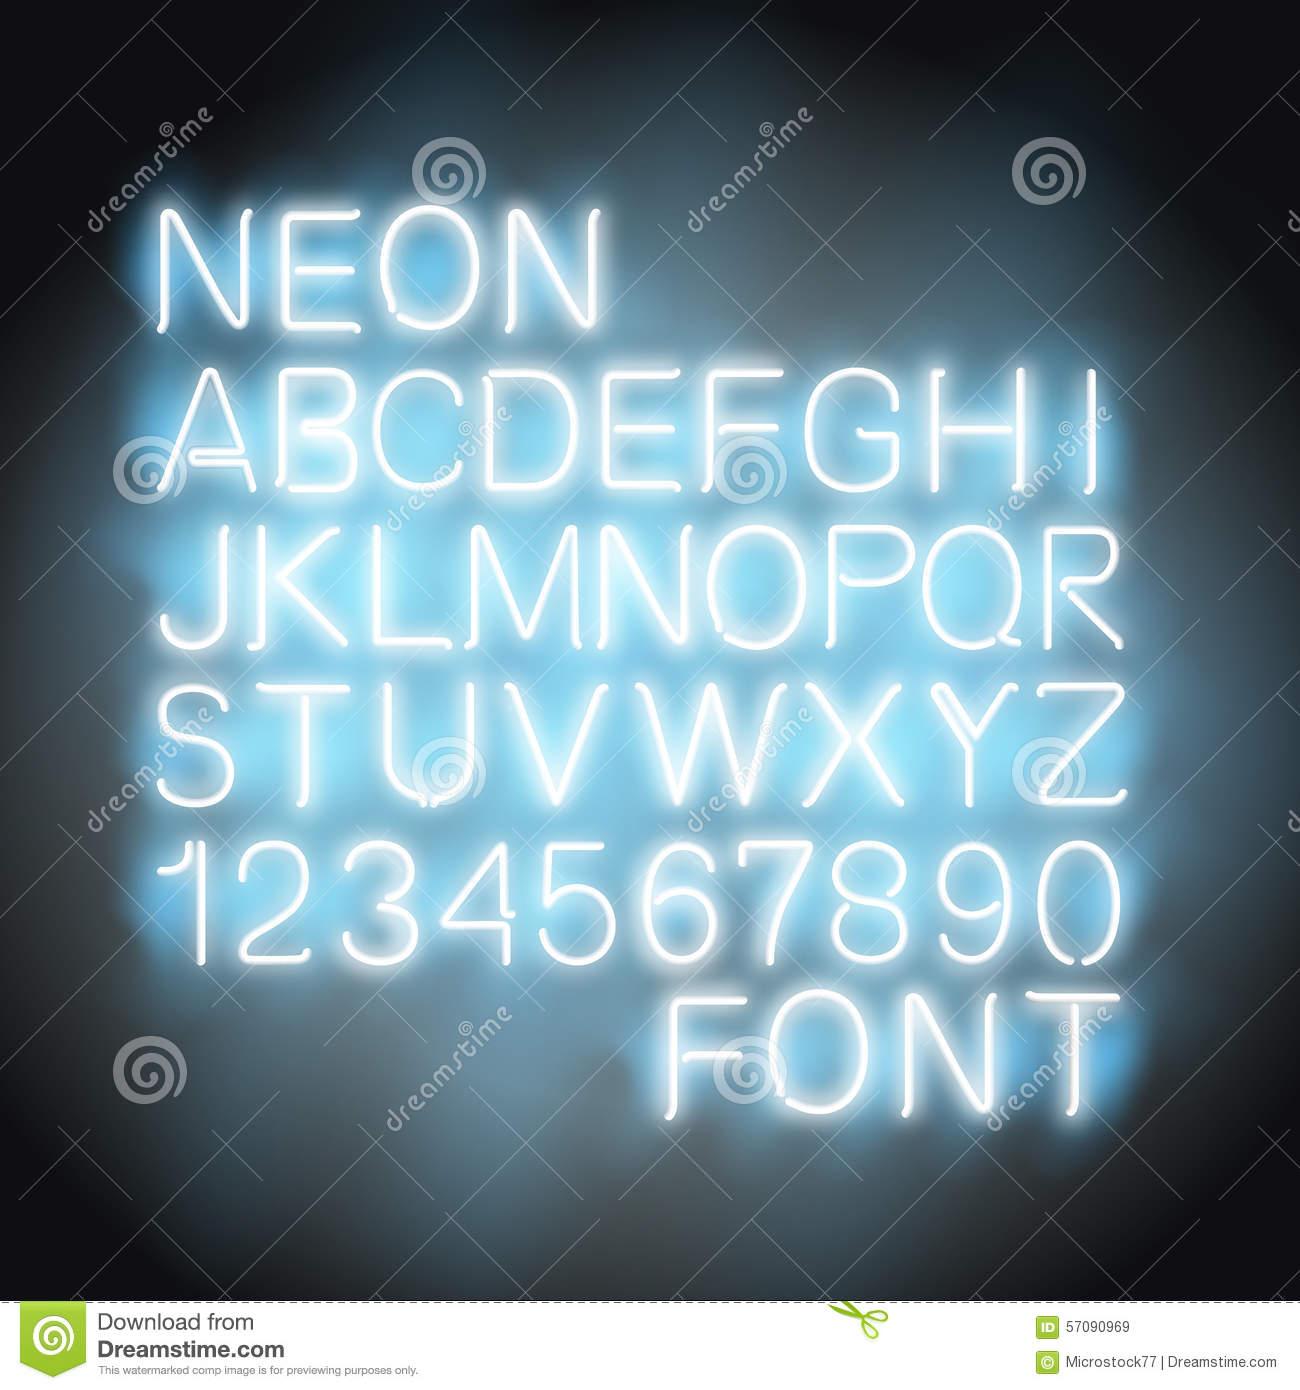 Neon Stock Illustrations.